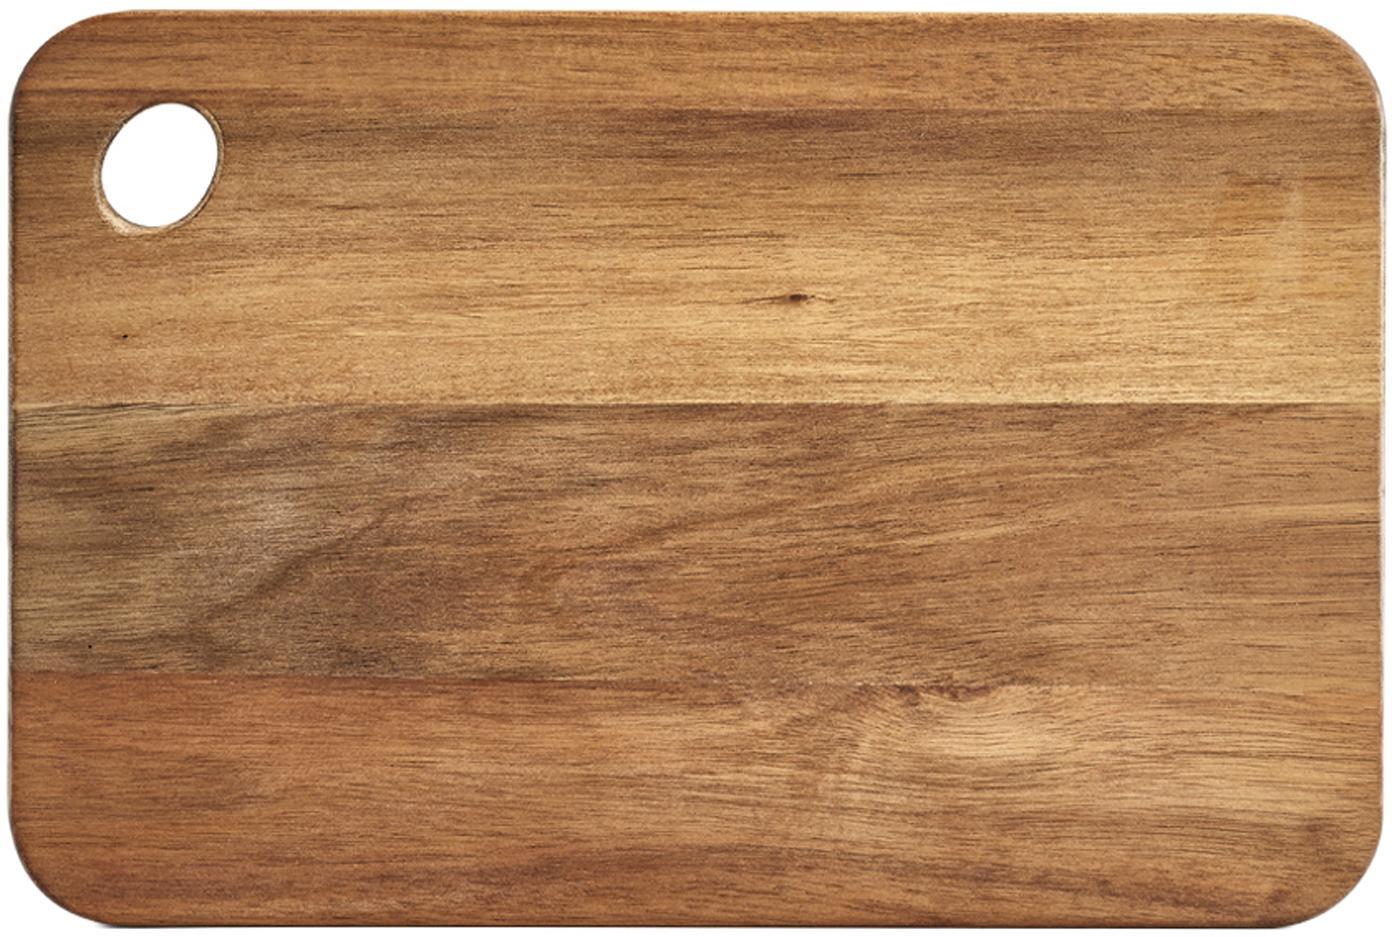 Snijplank Akana van acaciahout, Geolied acaciahout, Acaciahoutkleurig, B 37 x D 25 cm